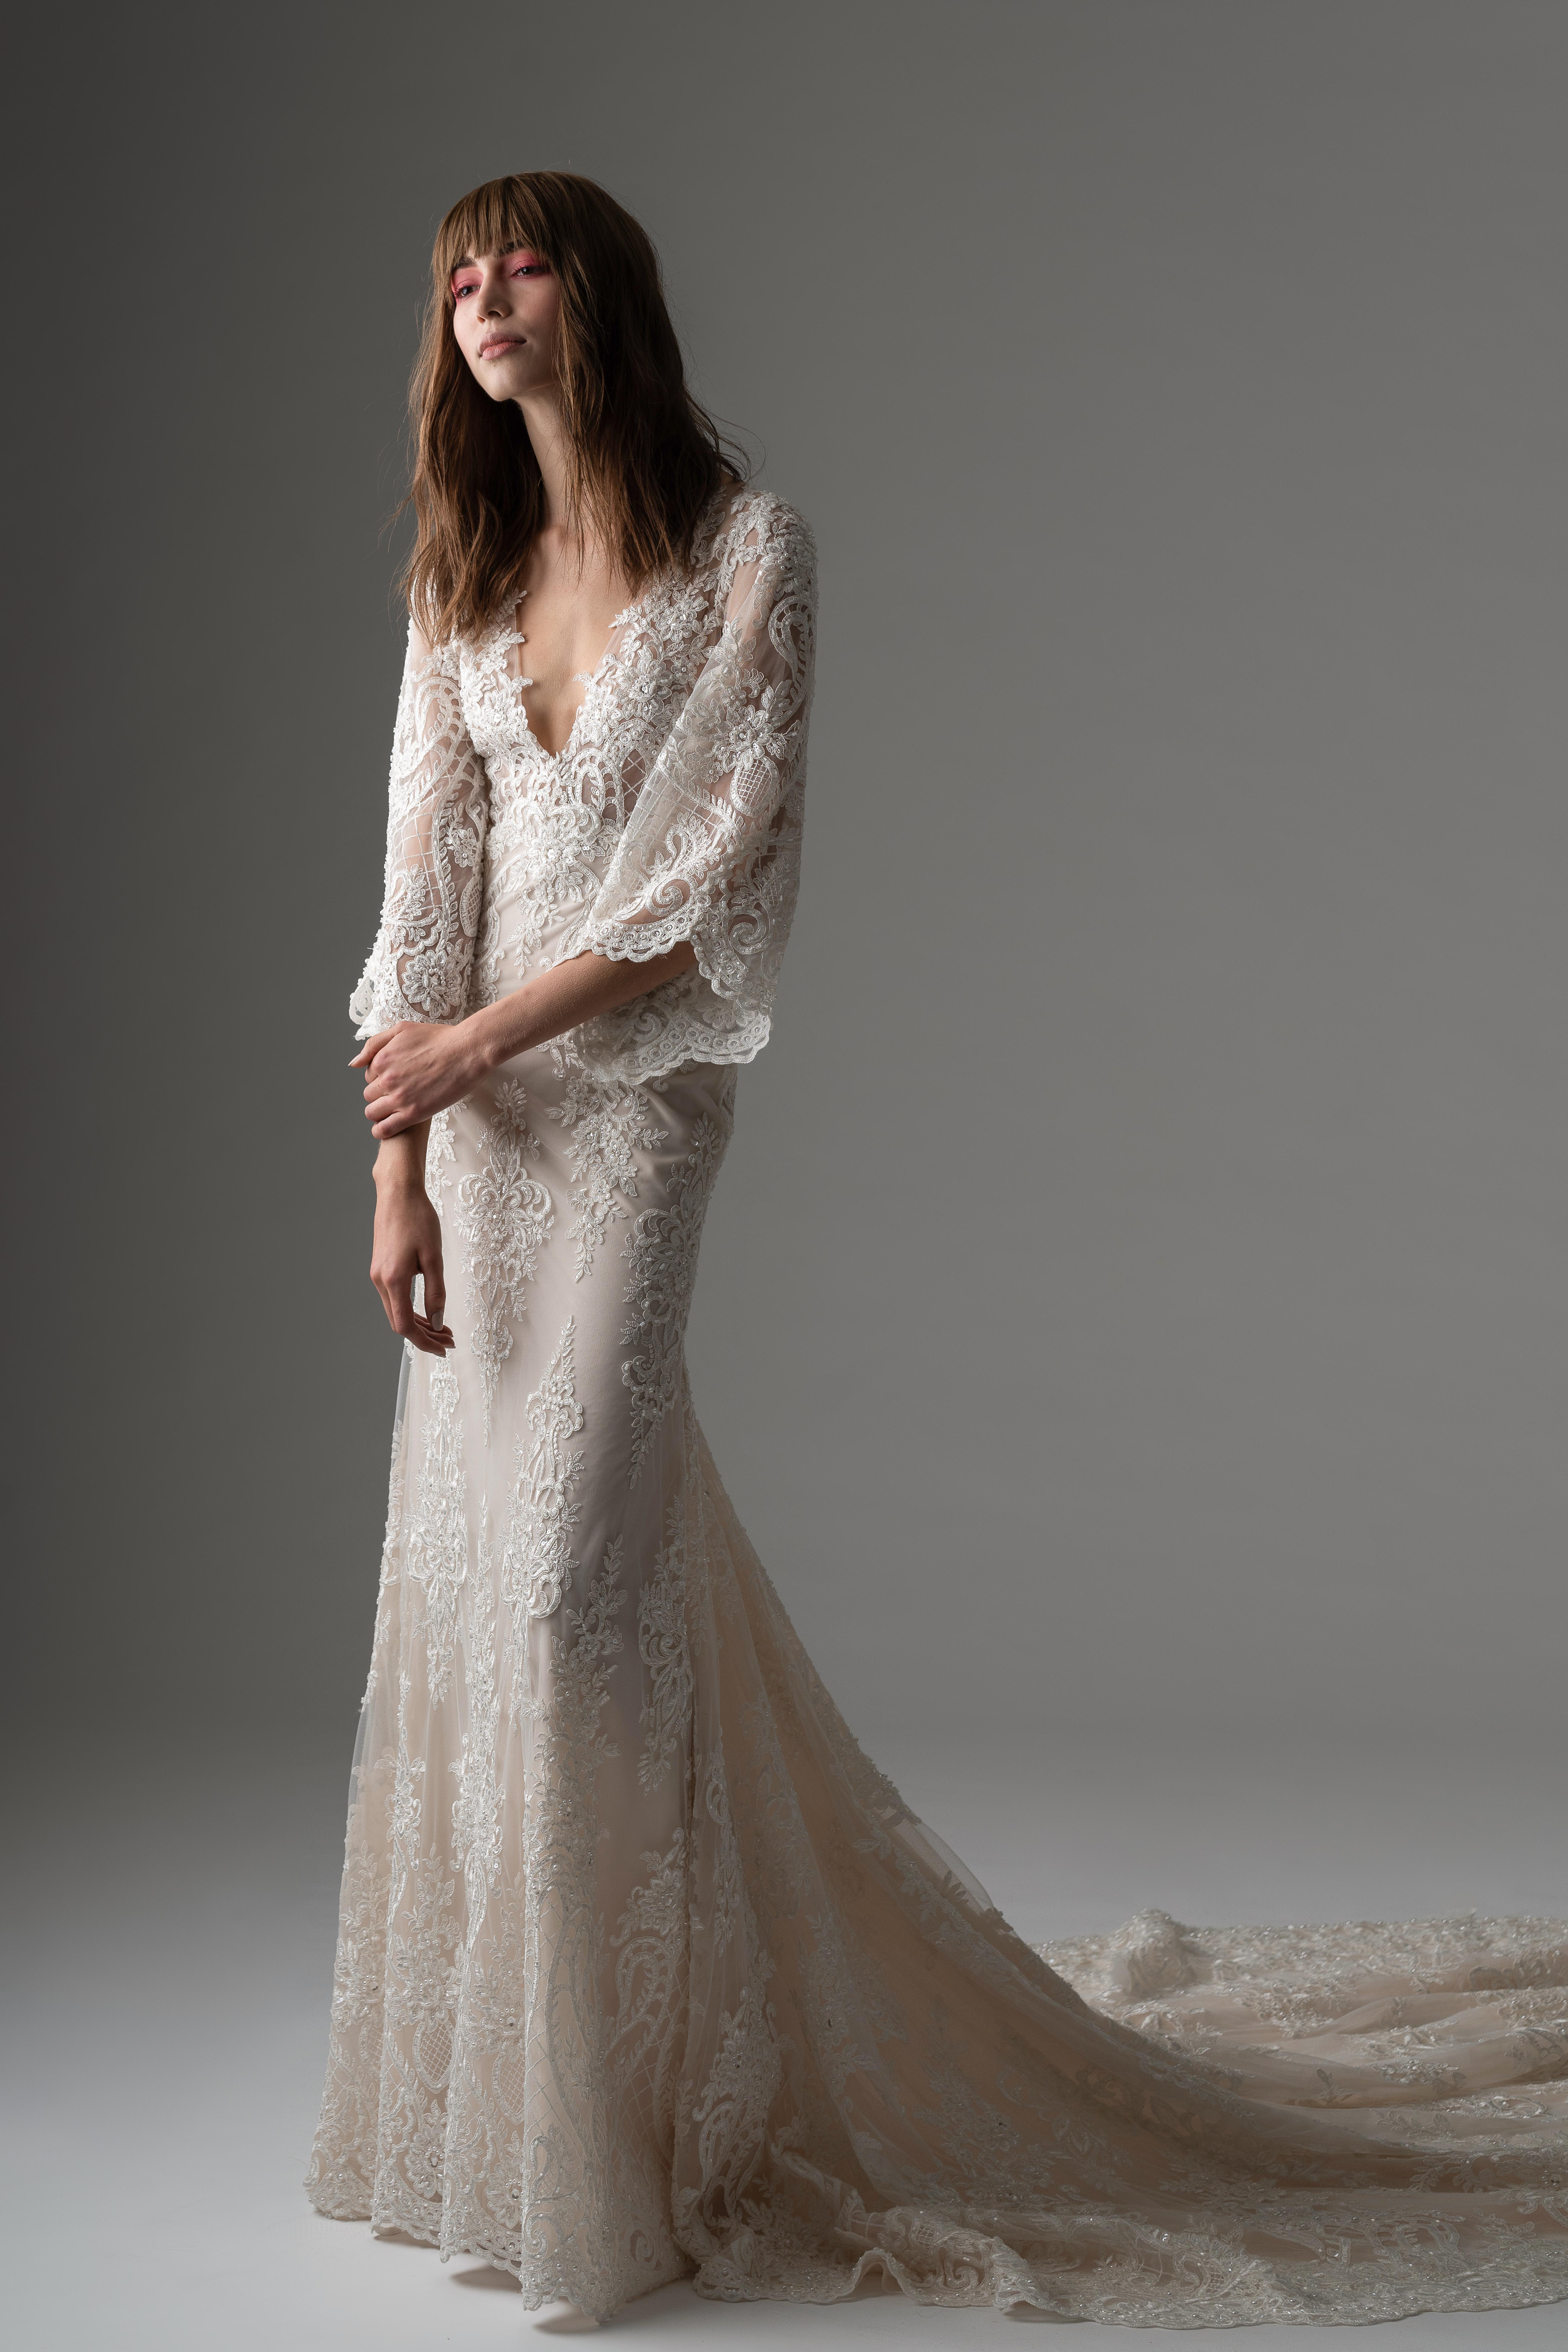 rivini by rita fall 2019 v-neck trumpet wedding dress